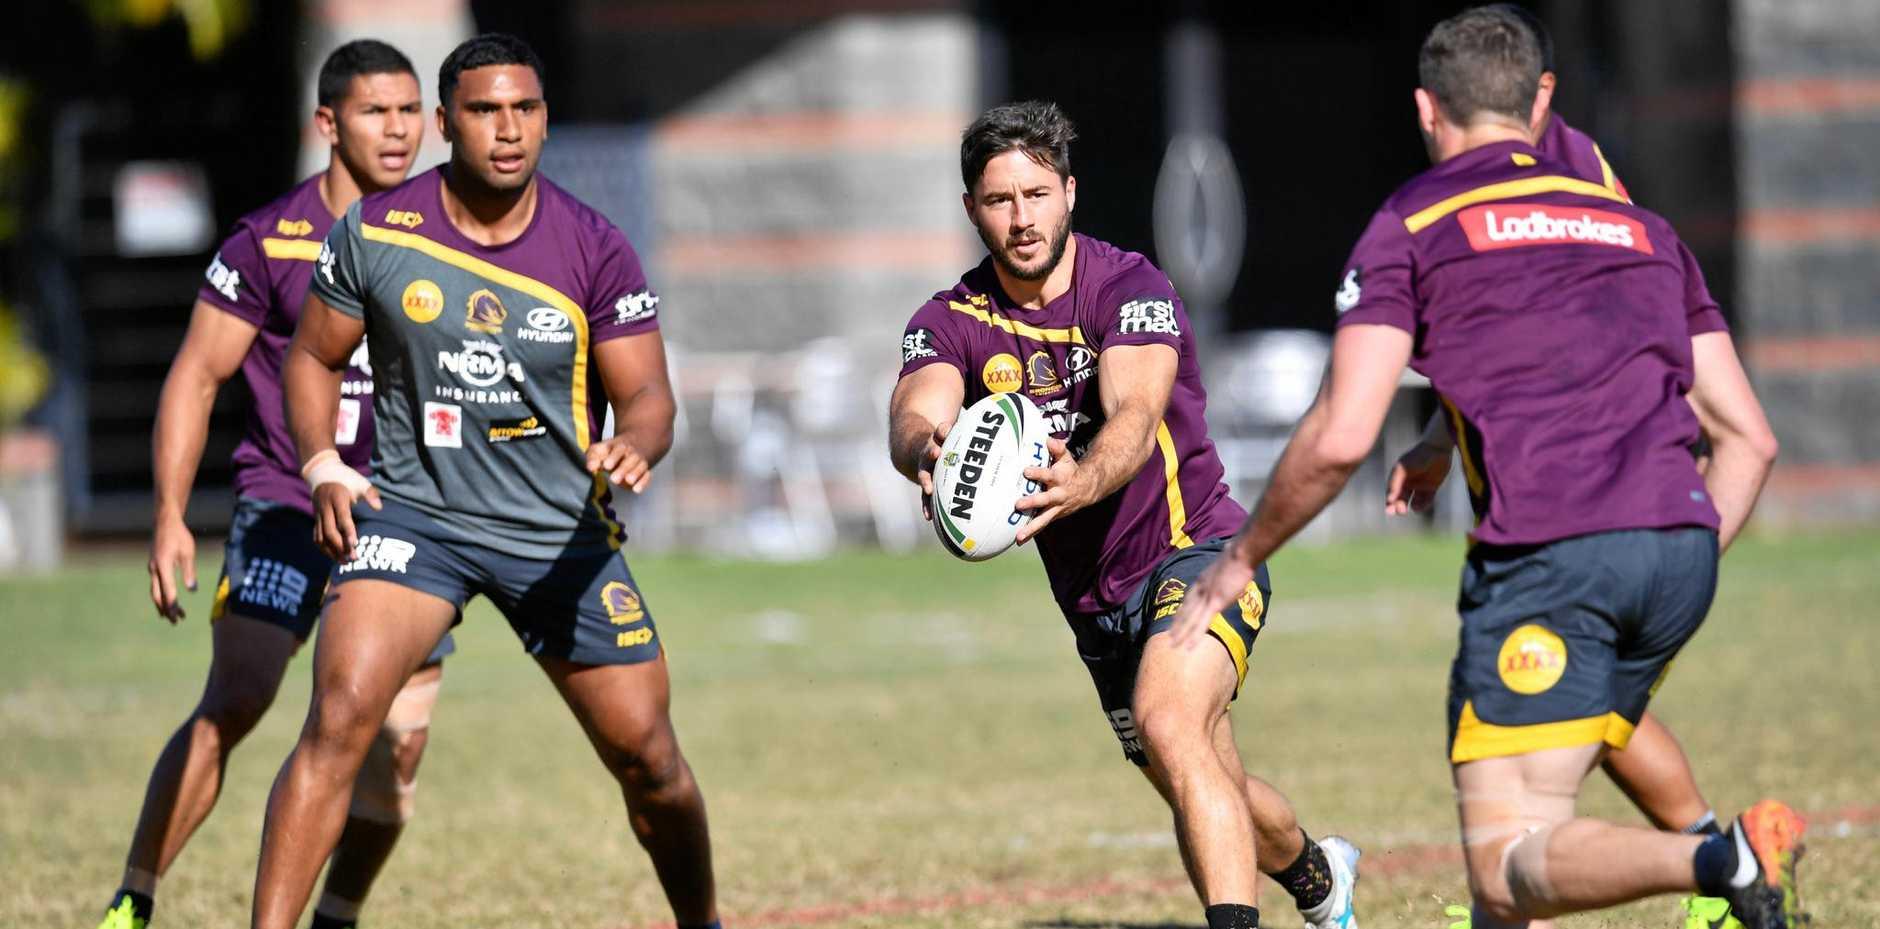 Brisbane Broncos player Ben Hunt (centre) during a training session in Brisbane.